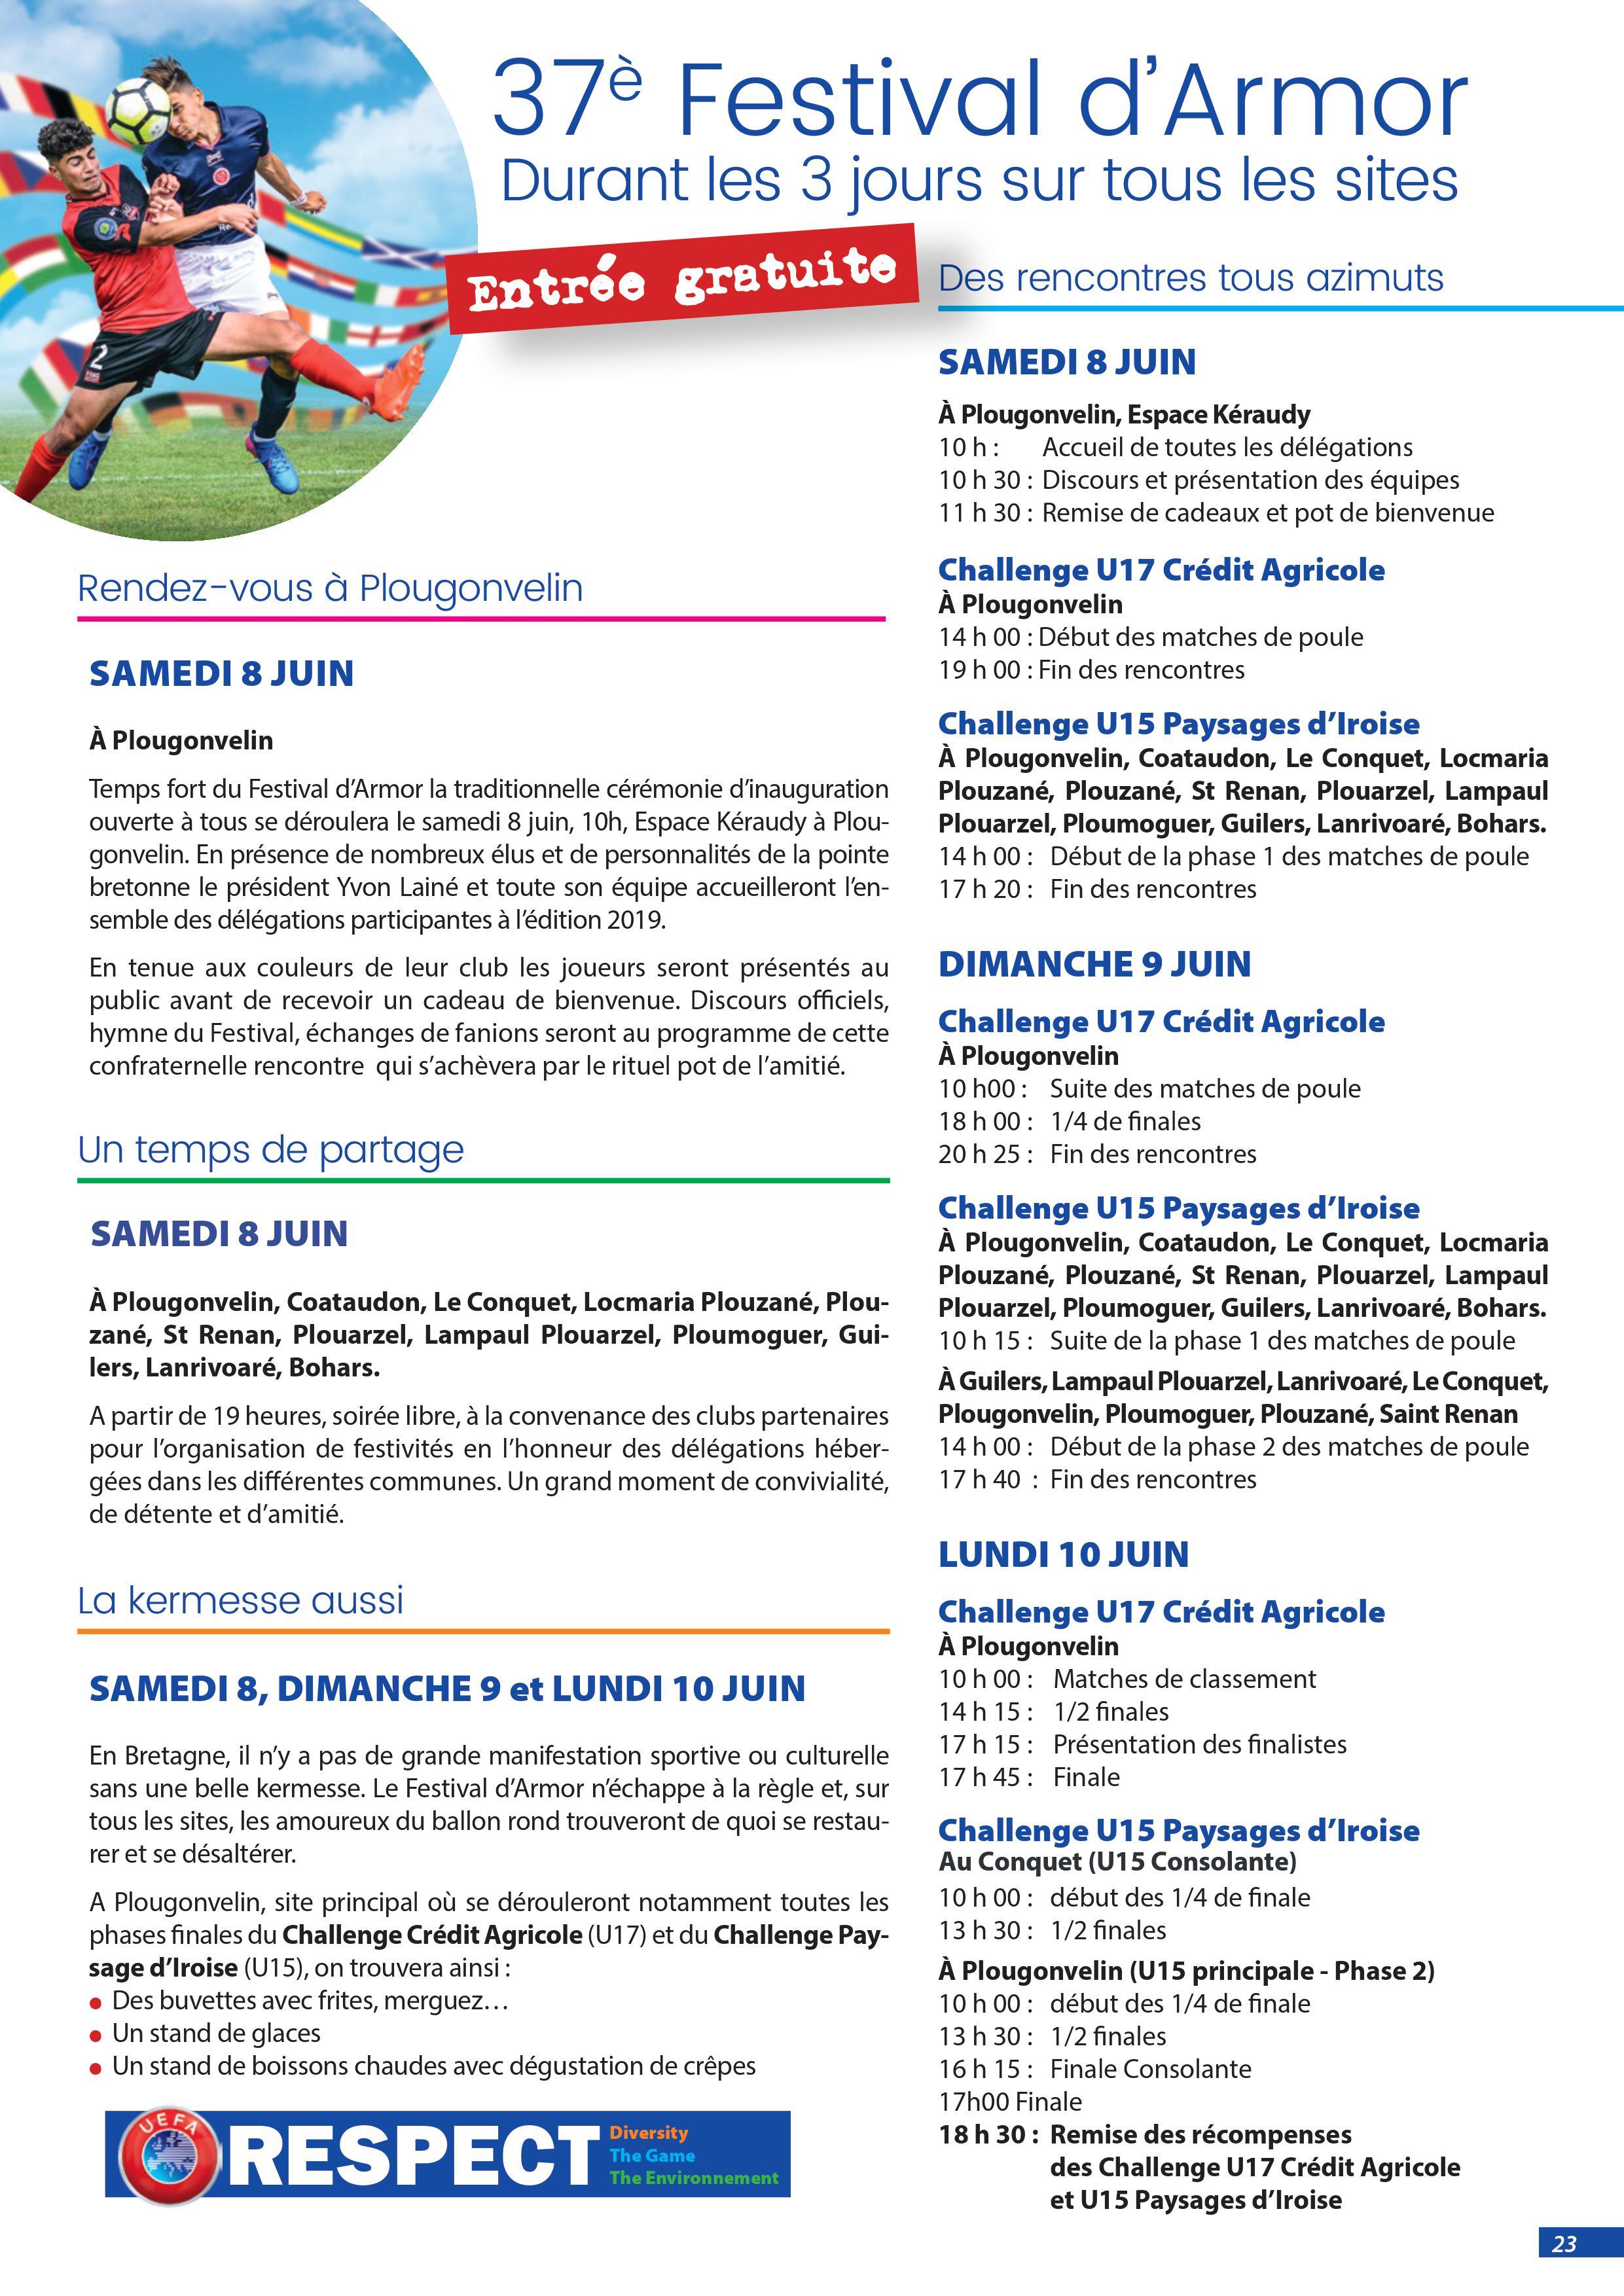 Programme du Festival d'Armor 1